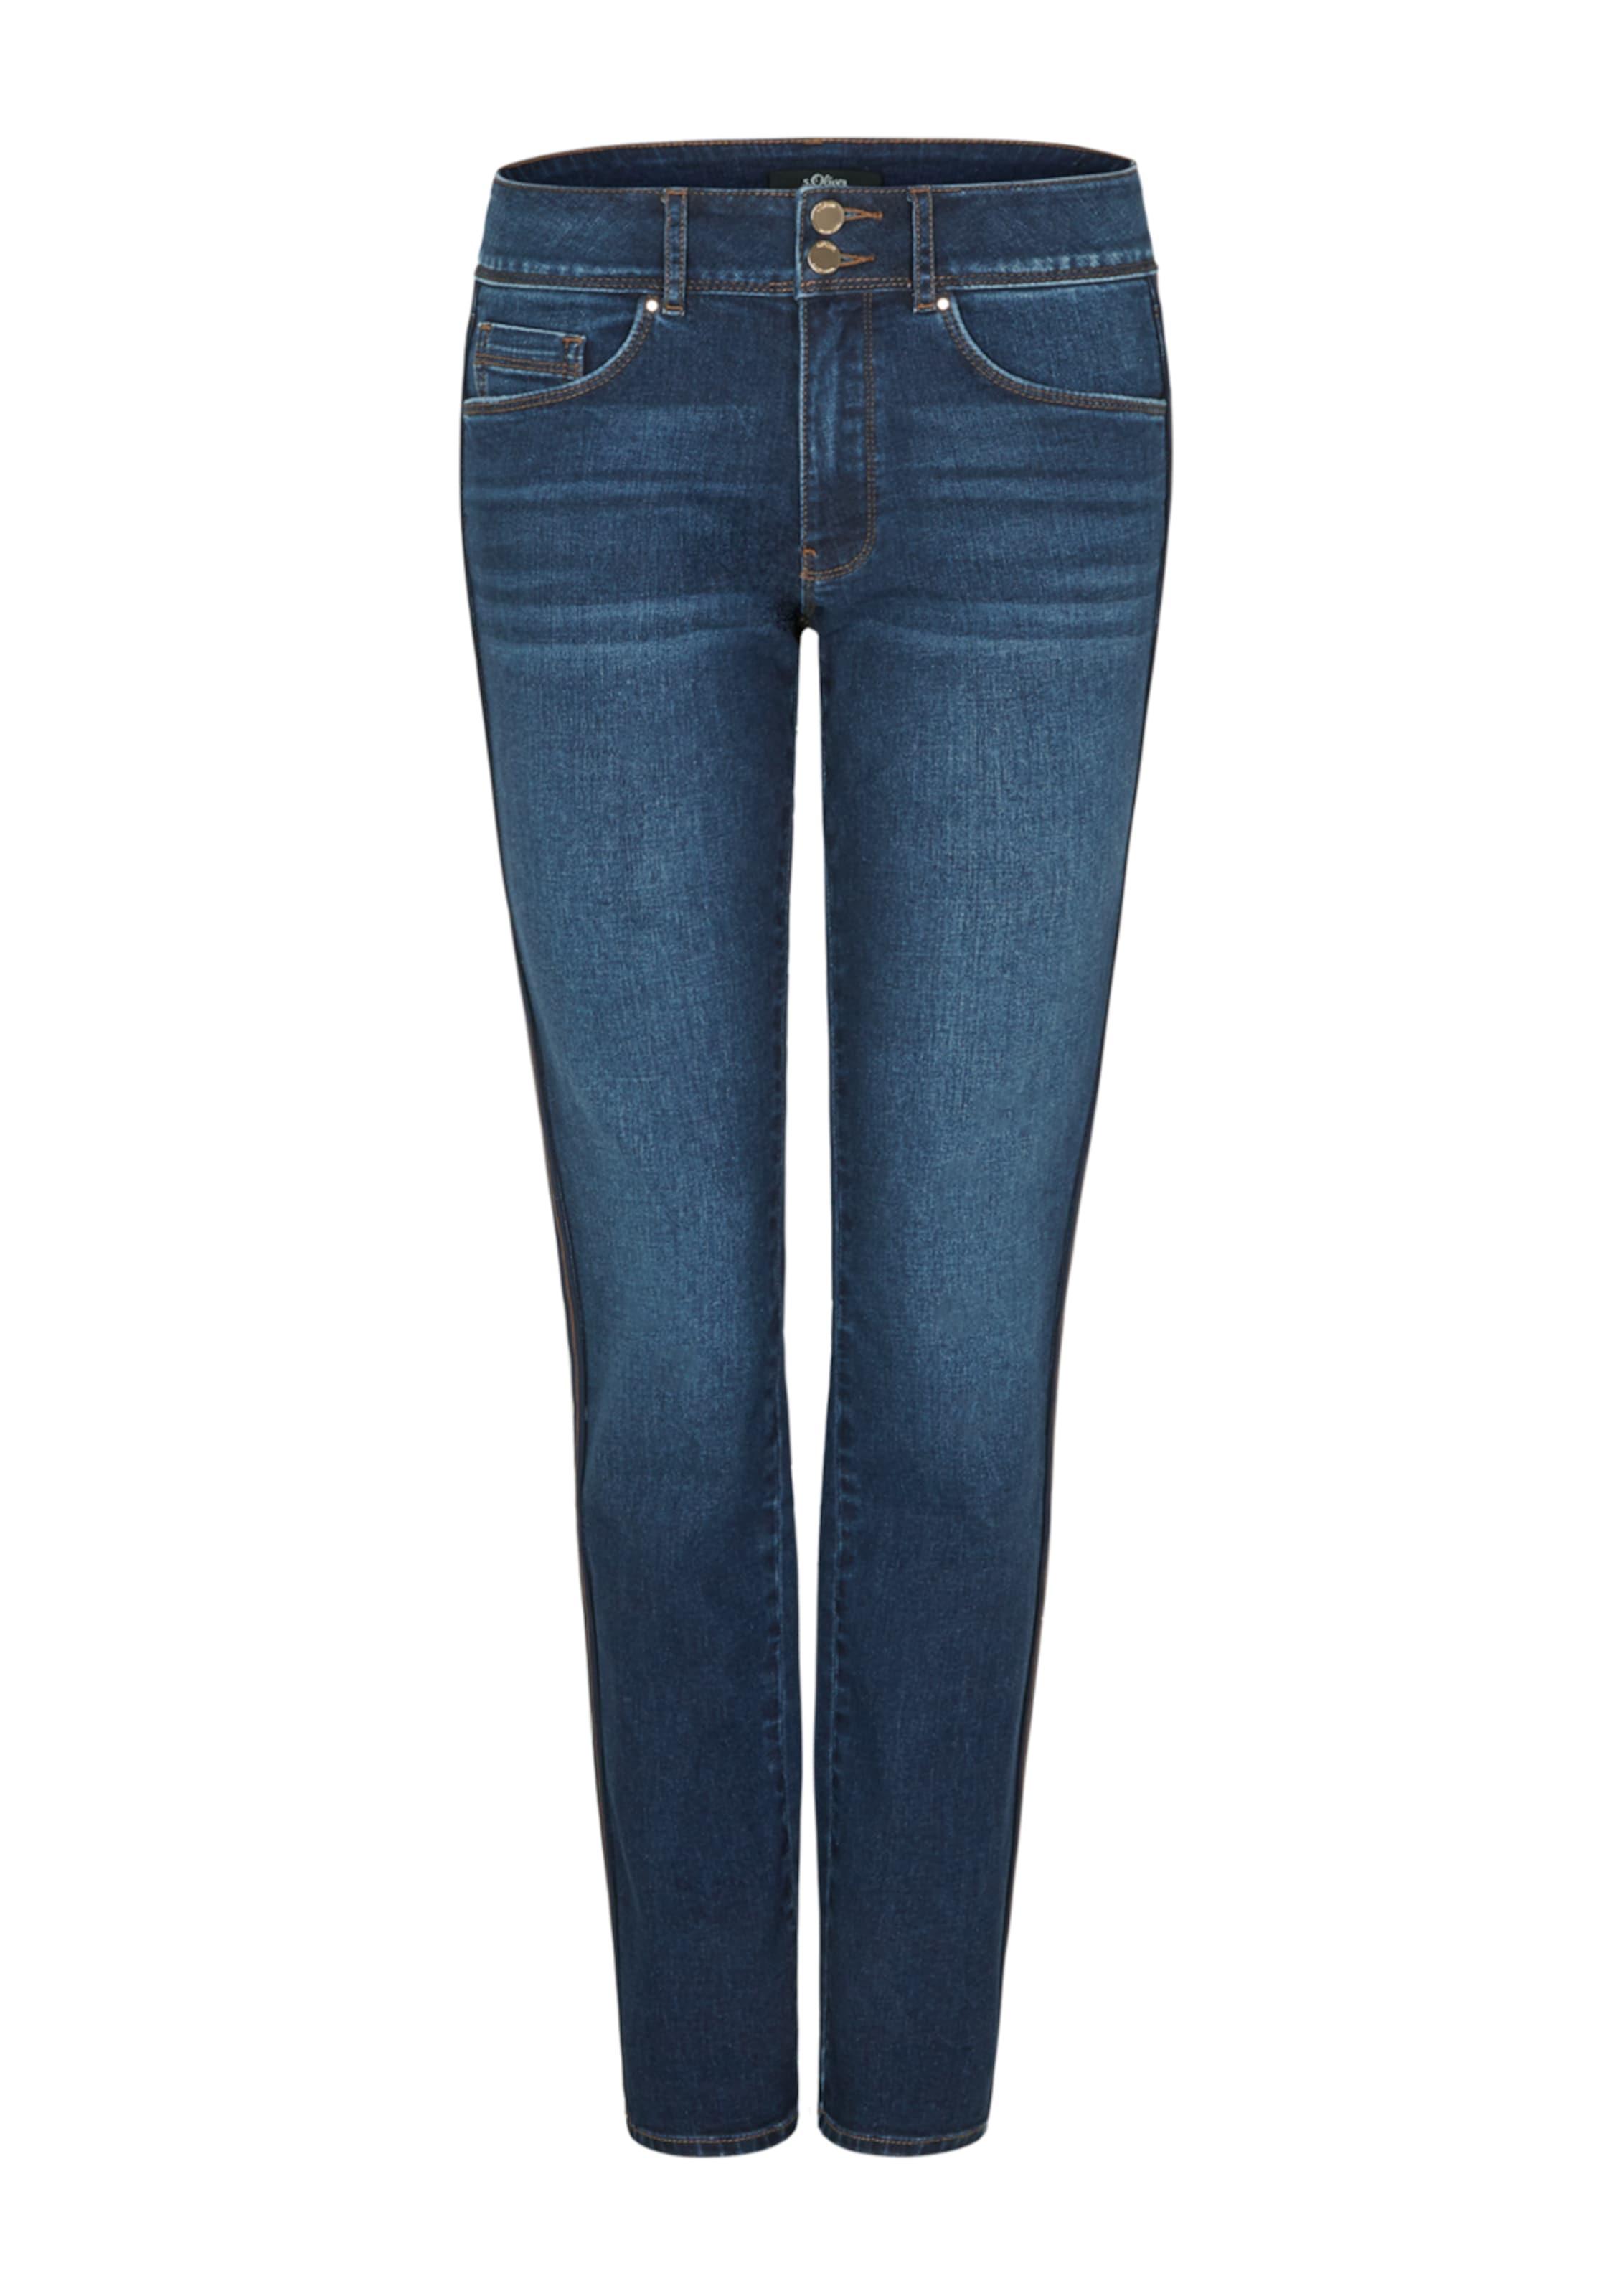 Black Blau S Jeans oliver In Label orxQeEdCWB